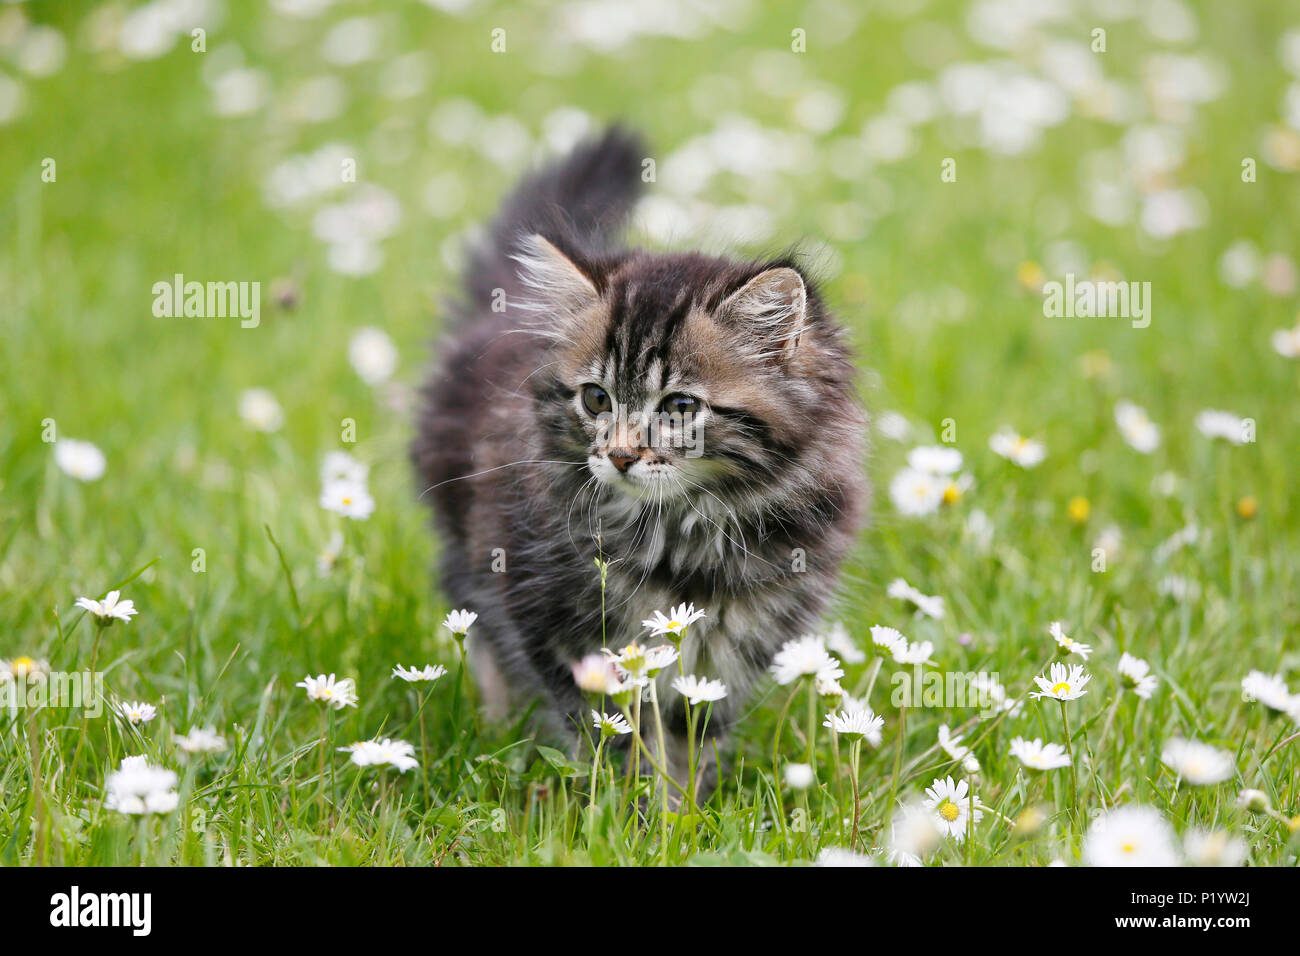 Seine et Marne. Female kitten aged 9 weeks running around in the grass. Daisies. Norwegian cat breed. - Stock Image